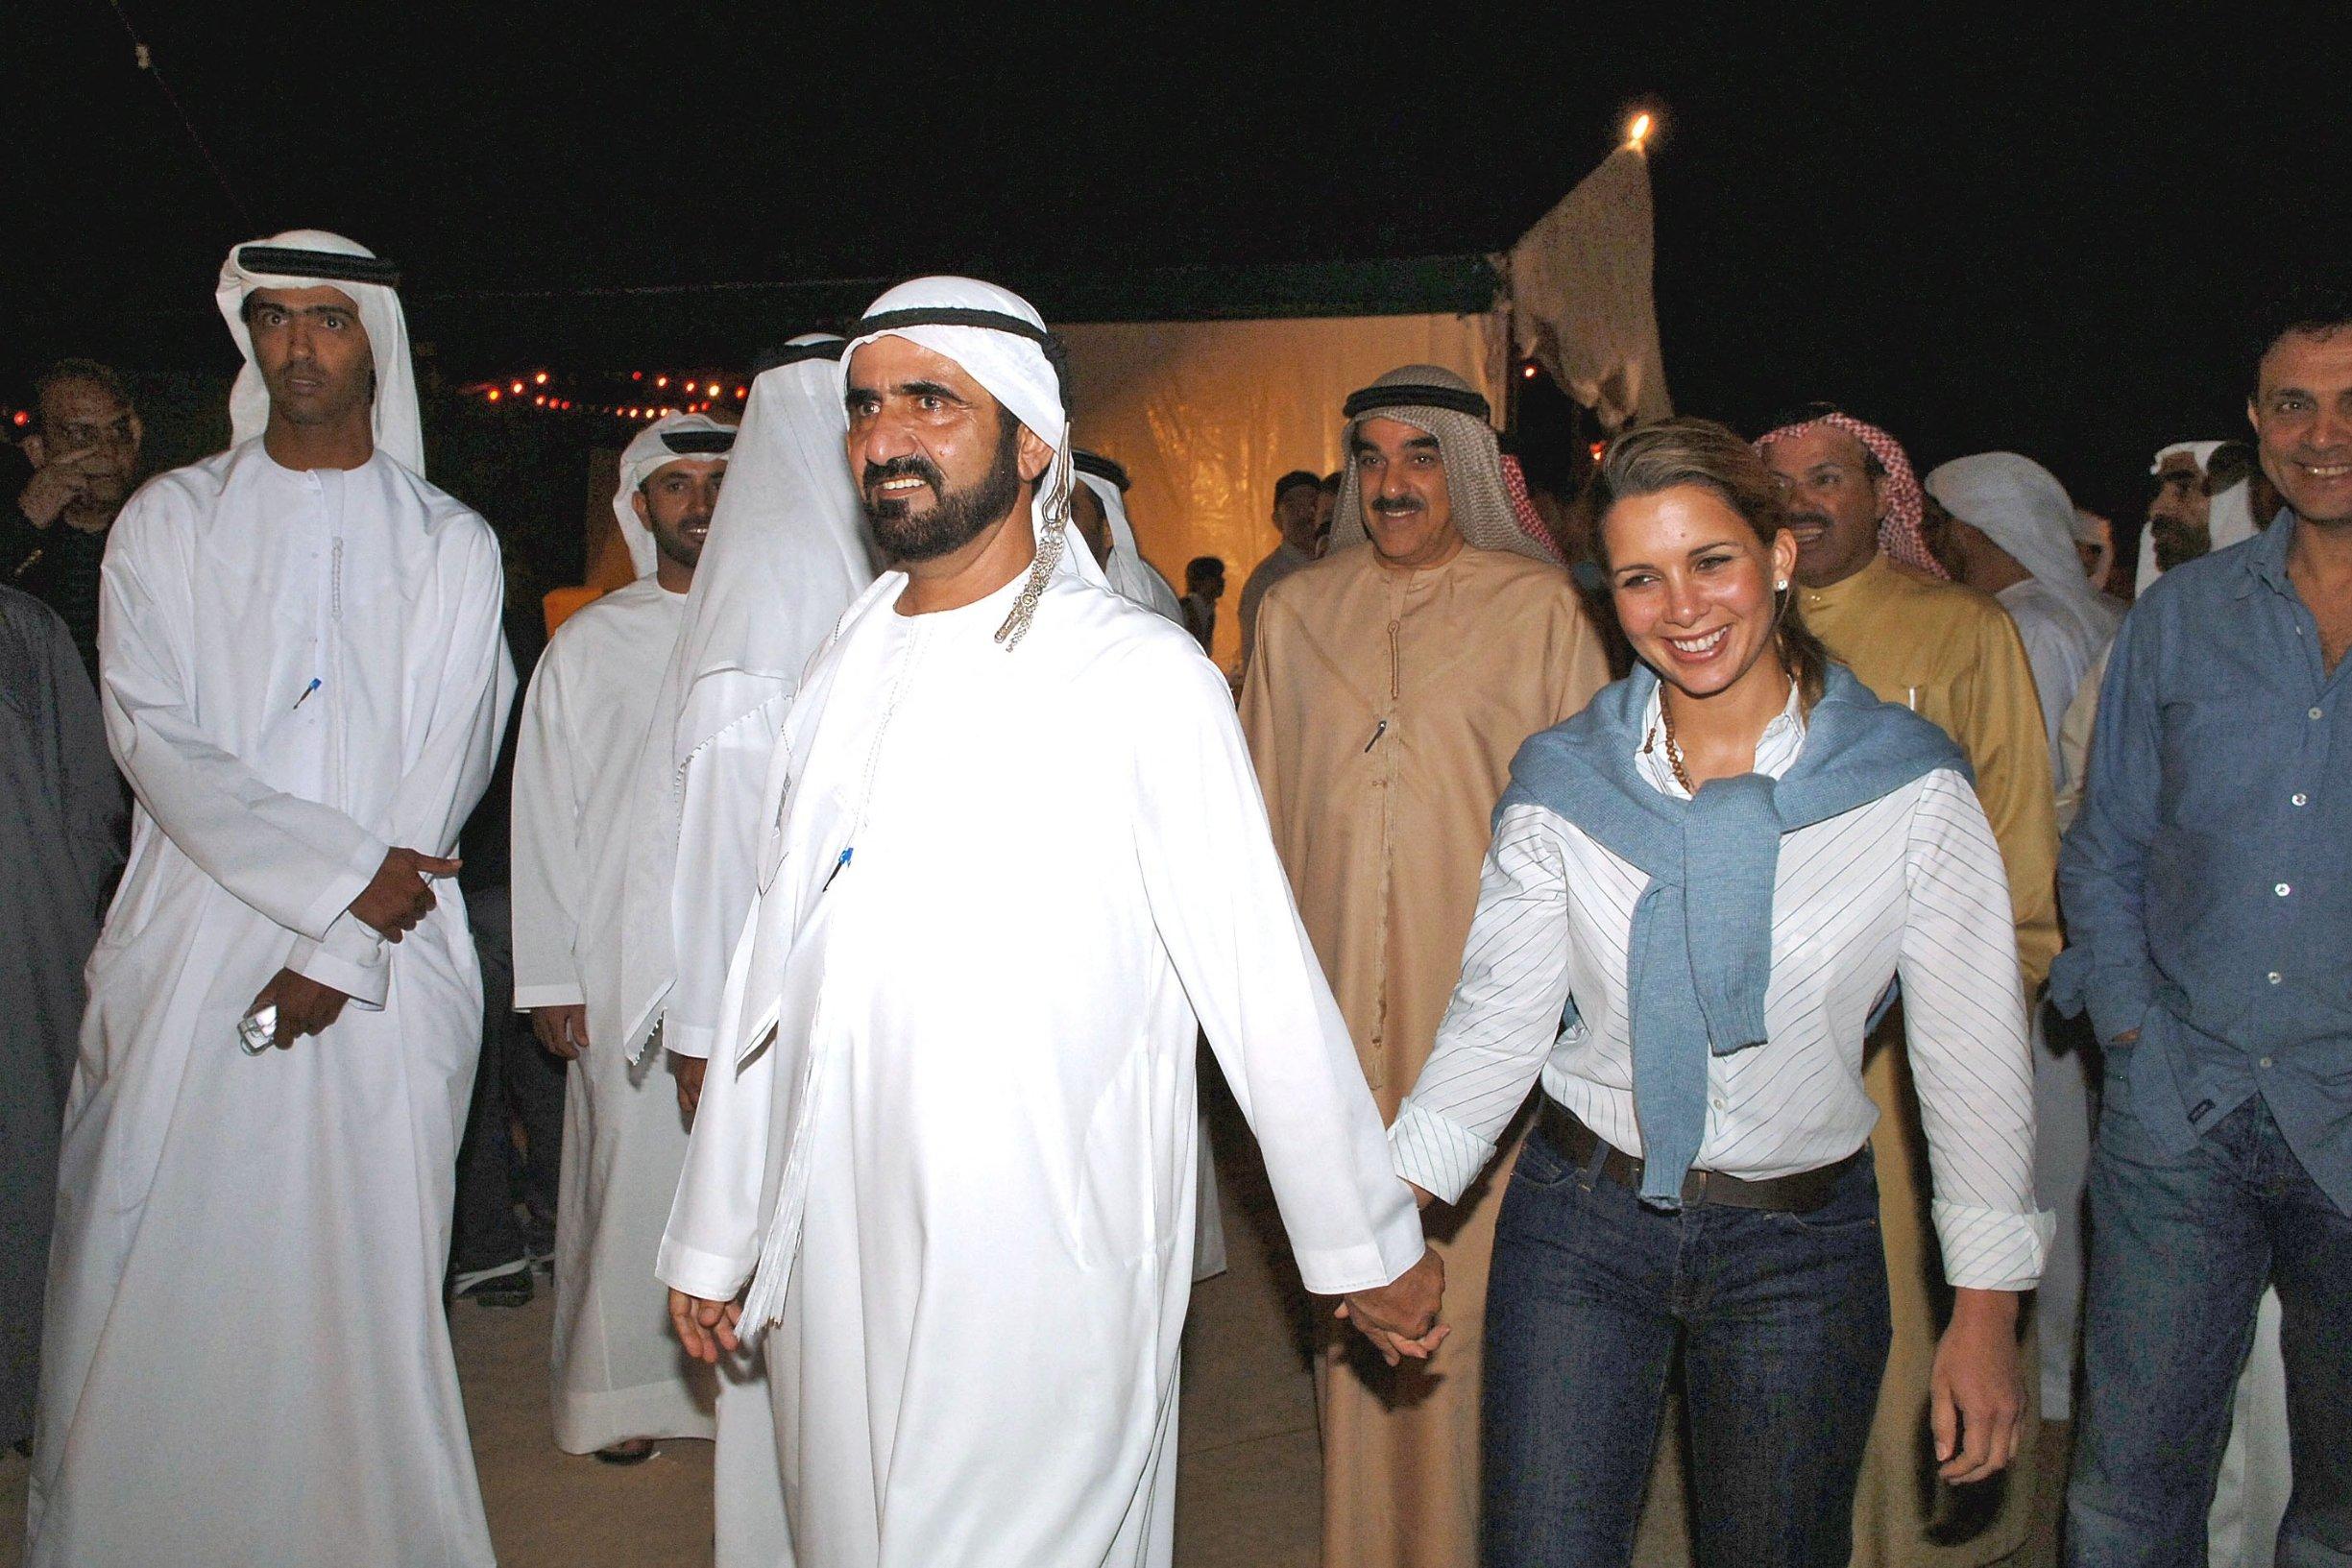 Princeza Haya Bint Al Hussein i njezin suprug šeik Mohammed bin Rashid Maktoum